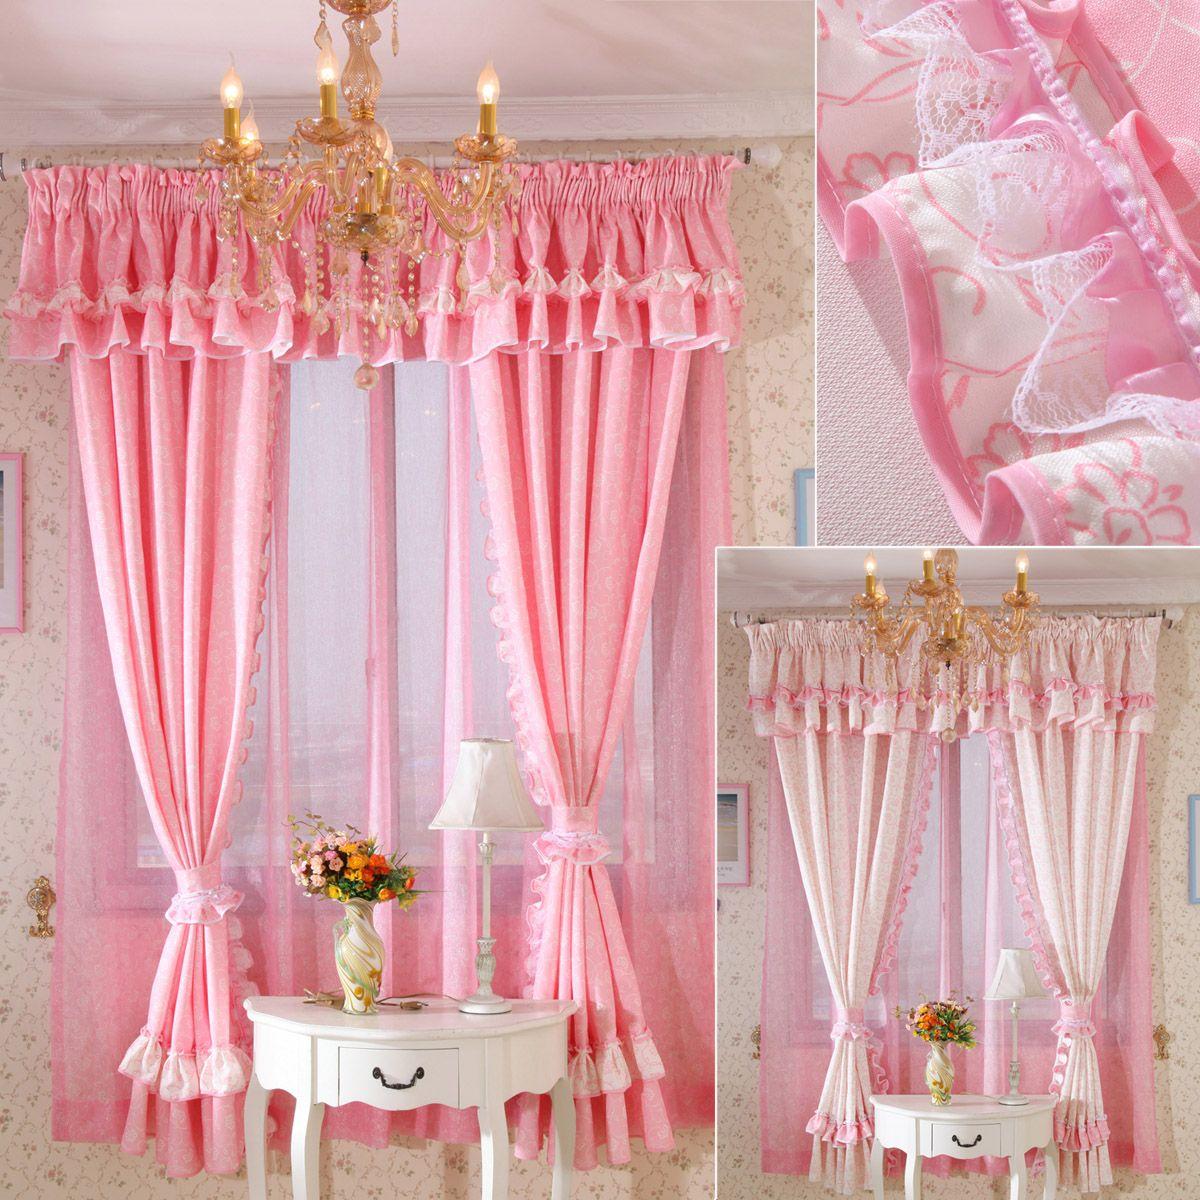 Cheap ni os cortinas cortinas de la ventana cortinas de for Cortinas para ninos